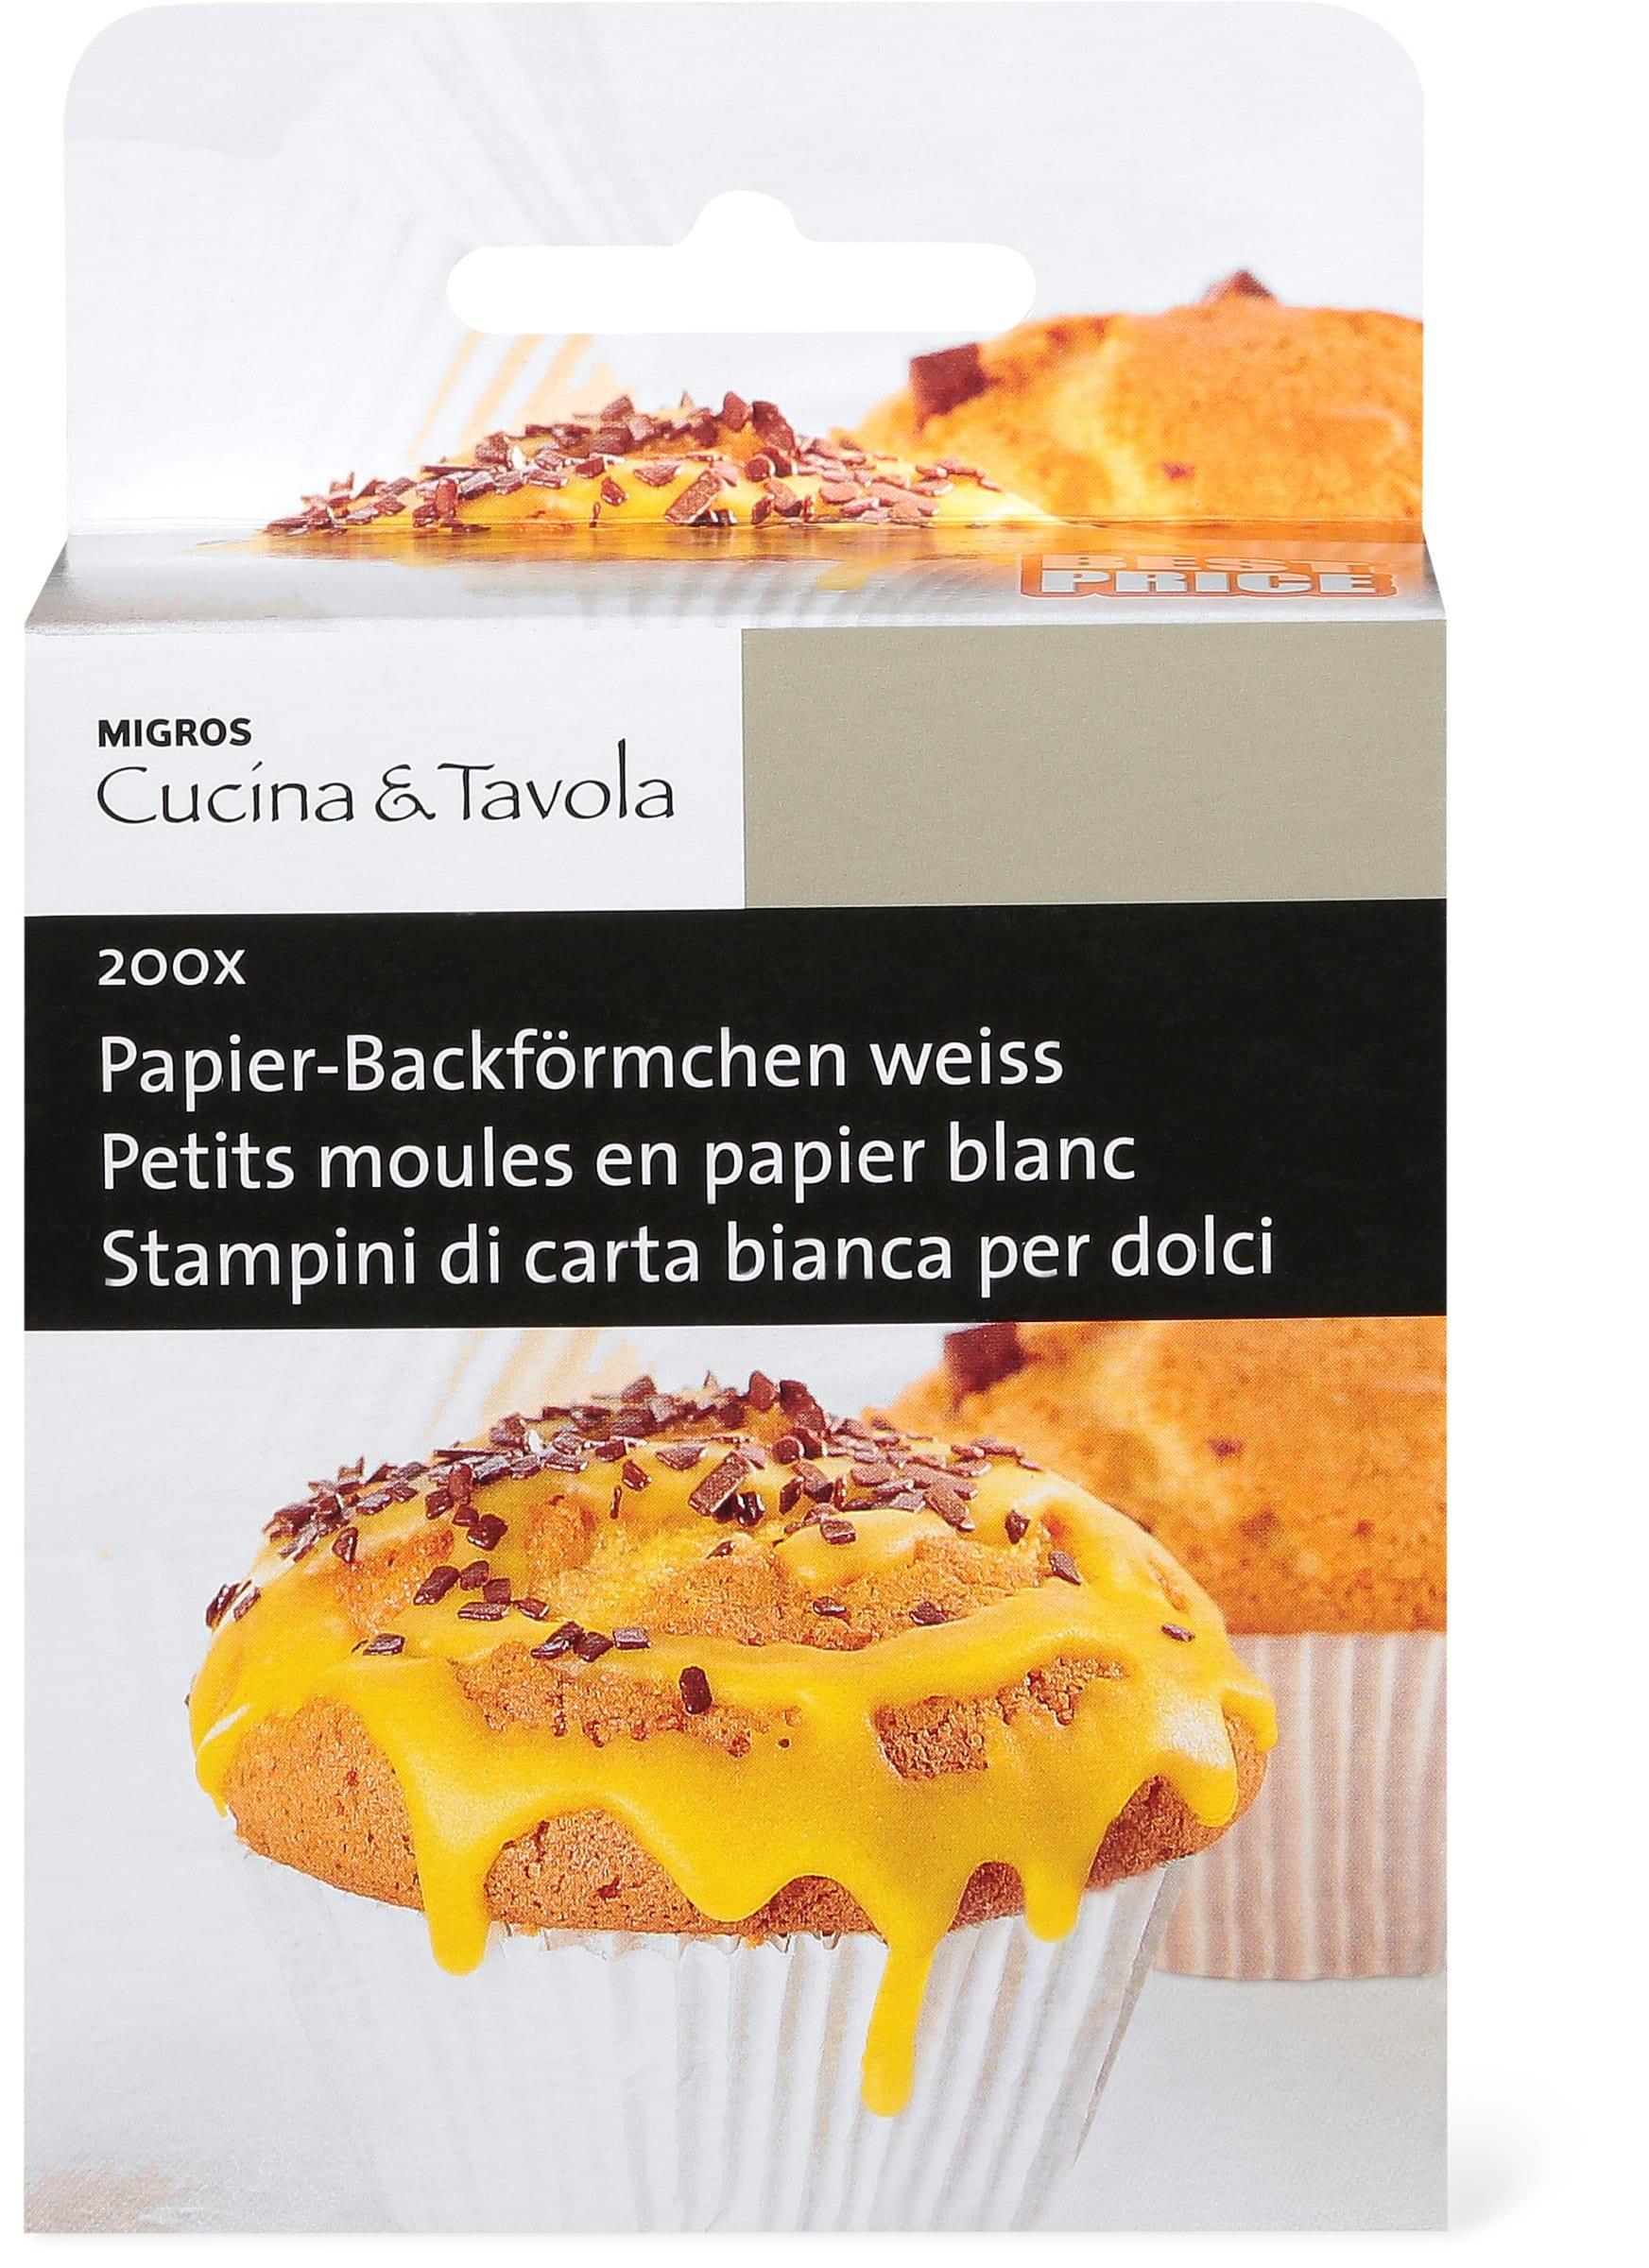 Cucina & Tavola Papier-Backförmchen